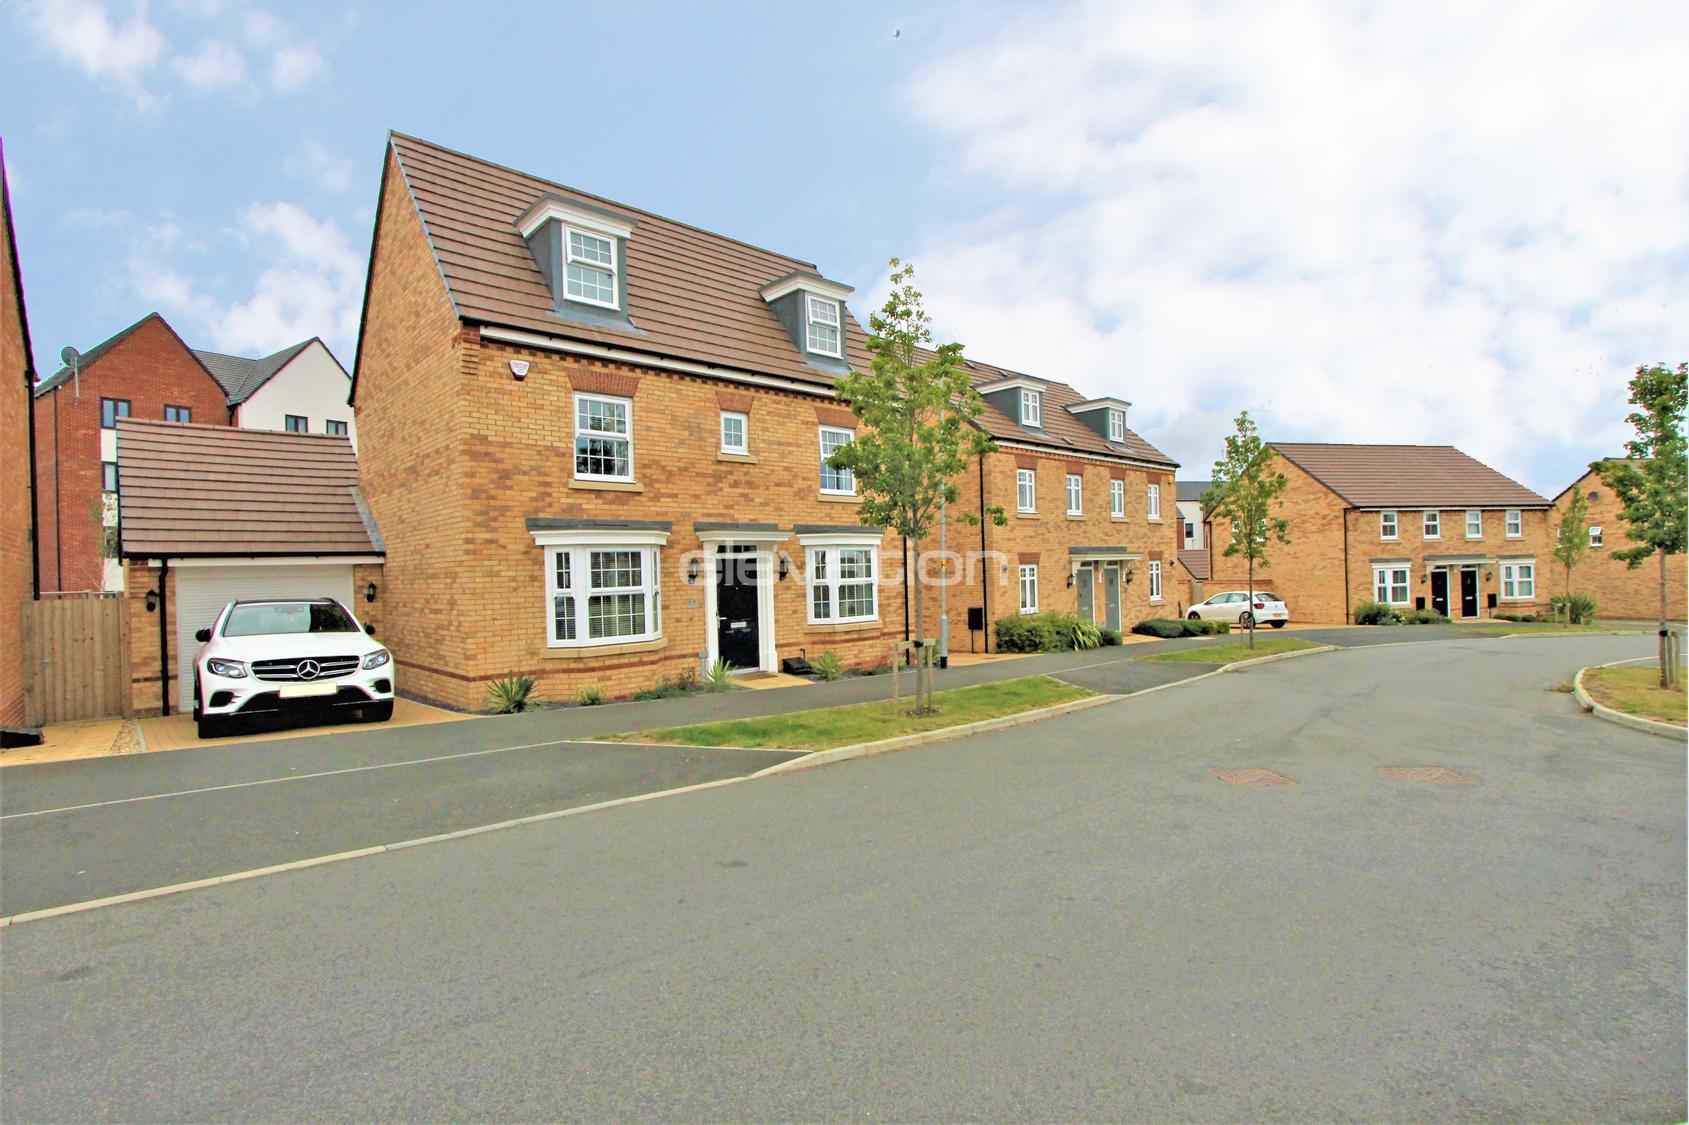 Bacchus Lane, Milton Keynes, Buckinghamshire Image